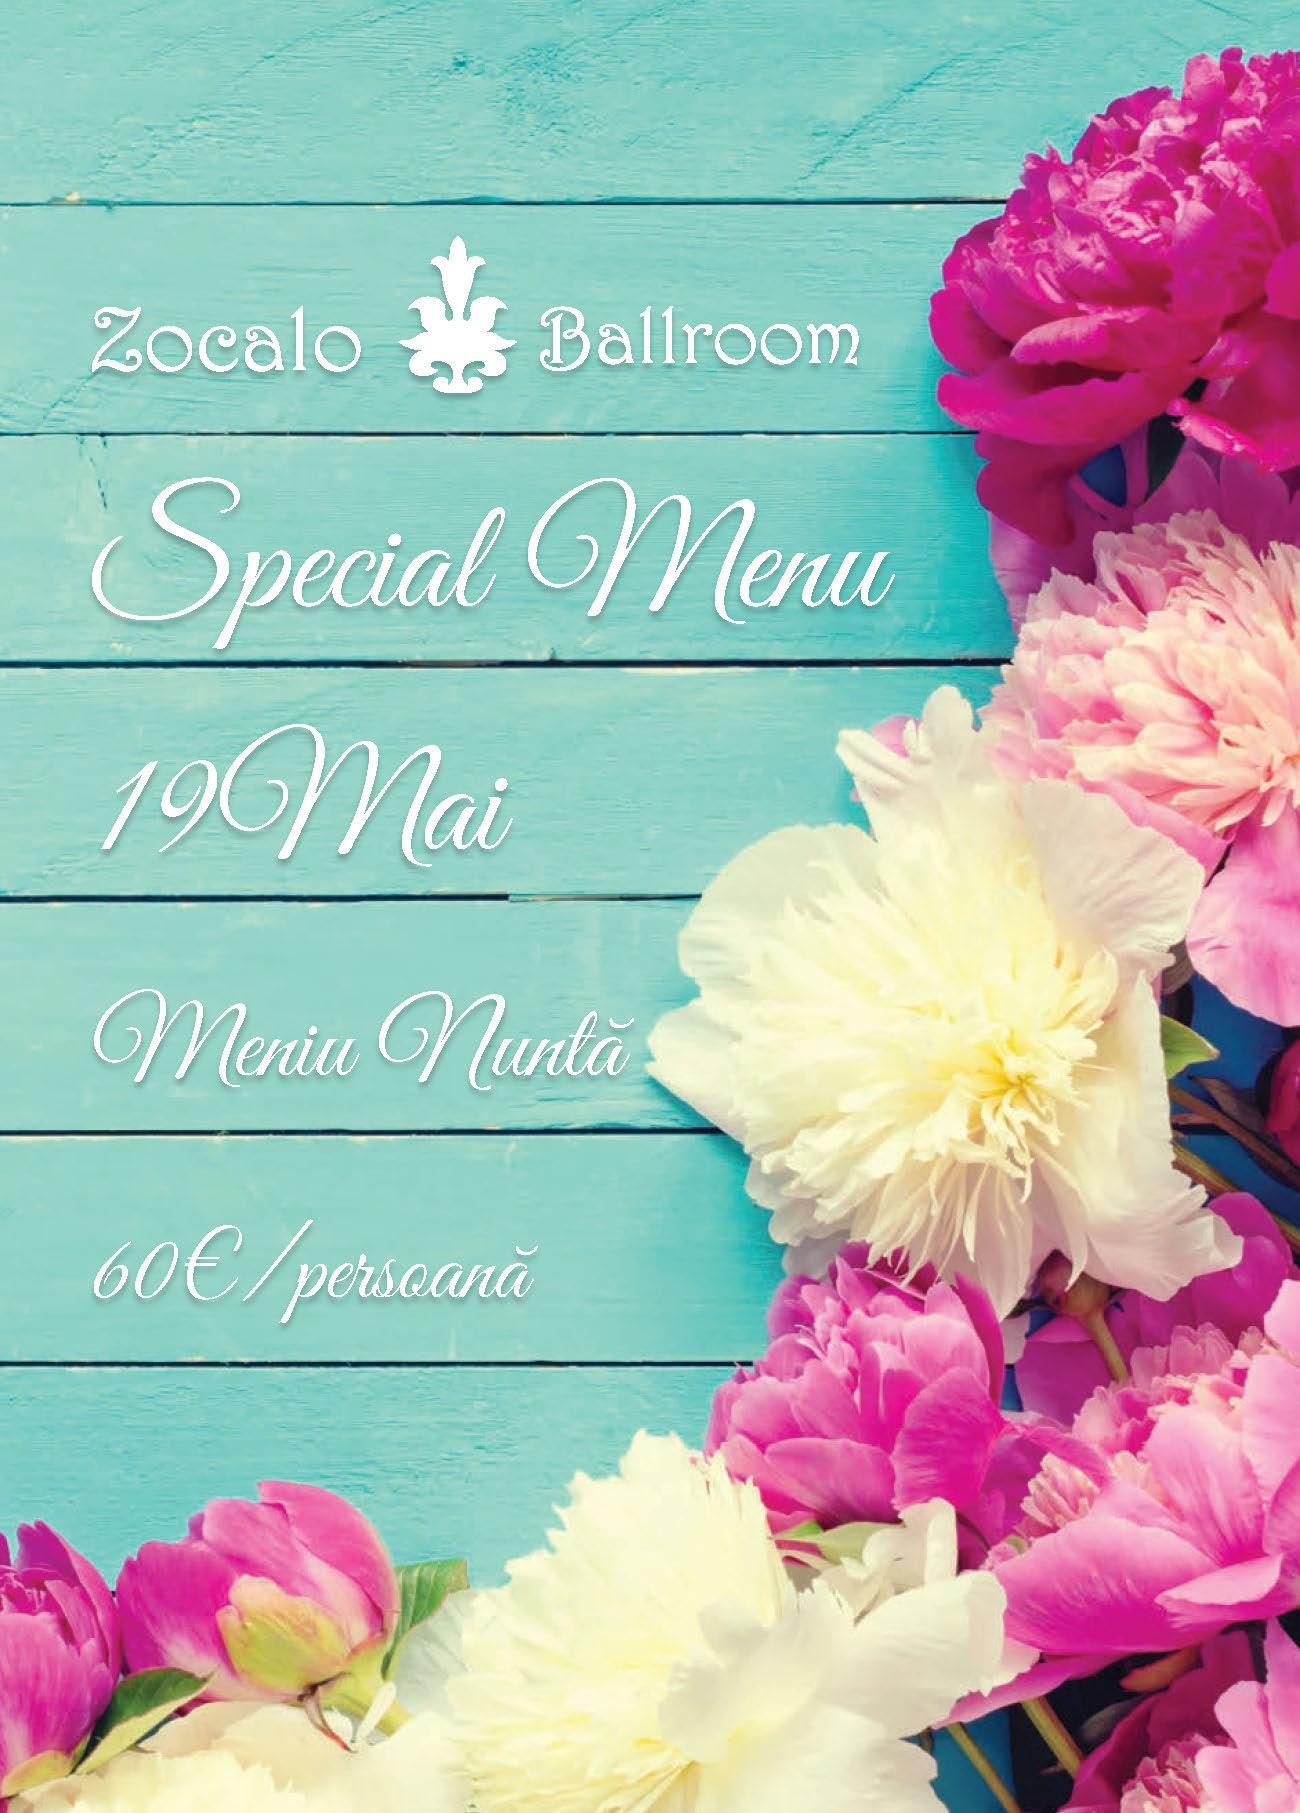 Oferta 19 mai nunta_Page_1